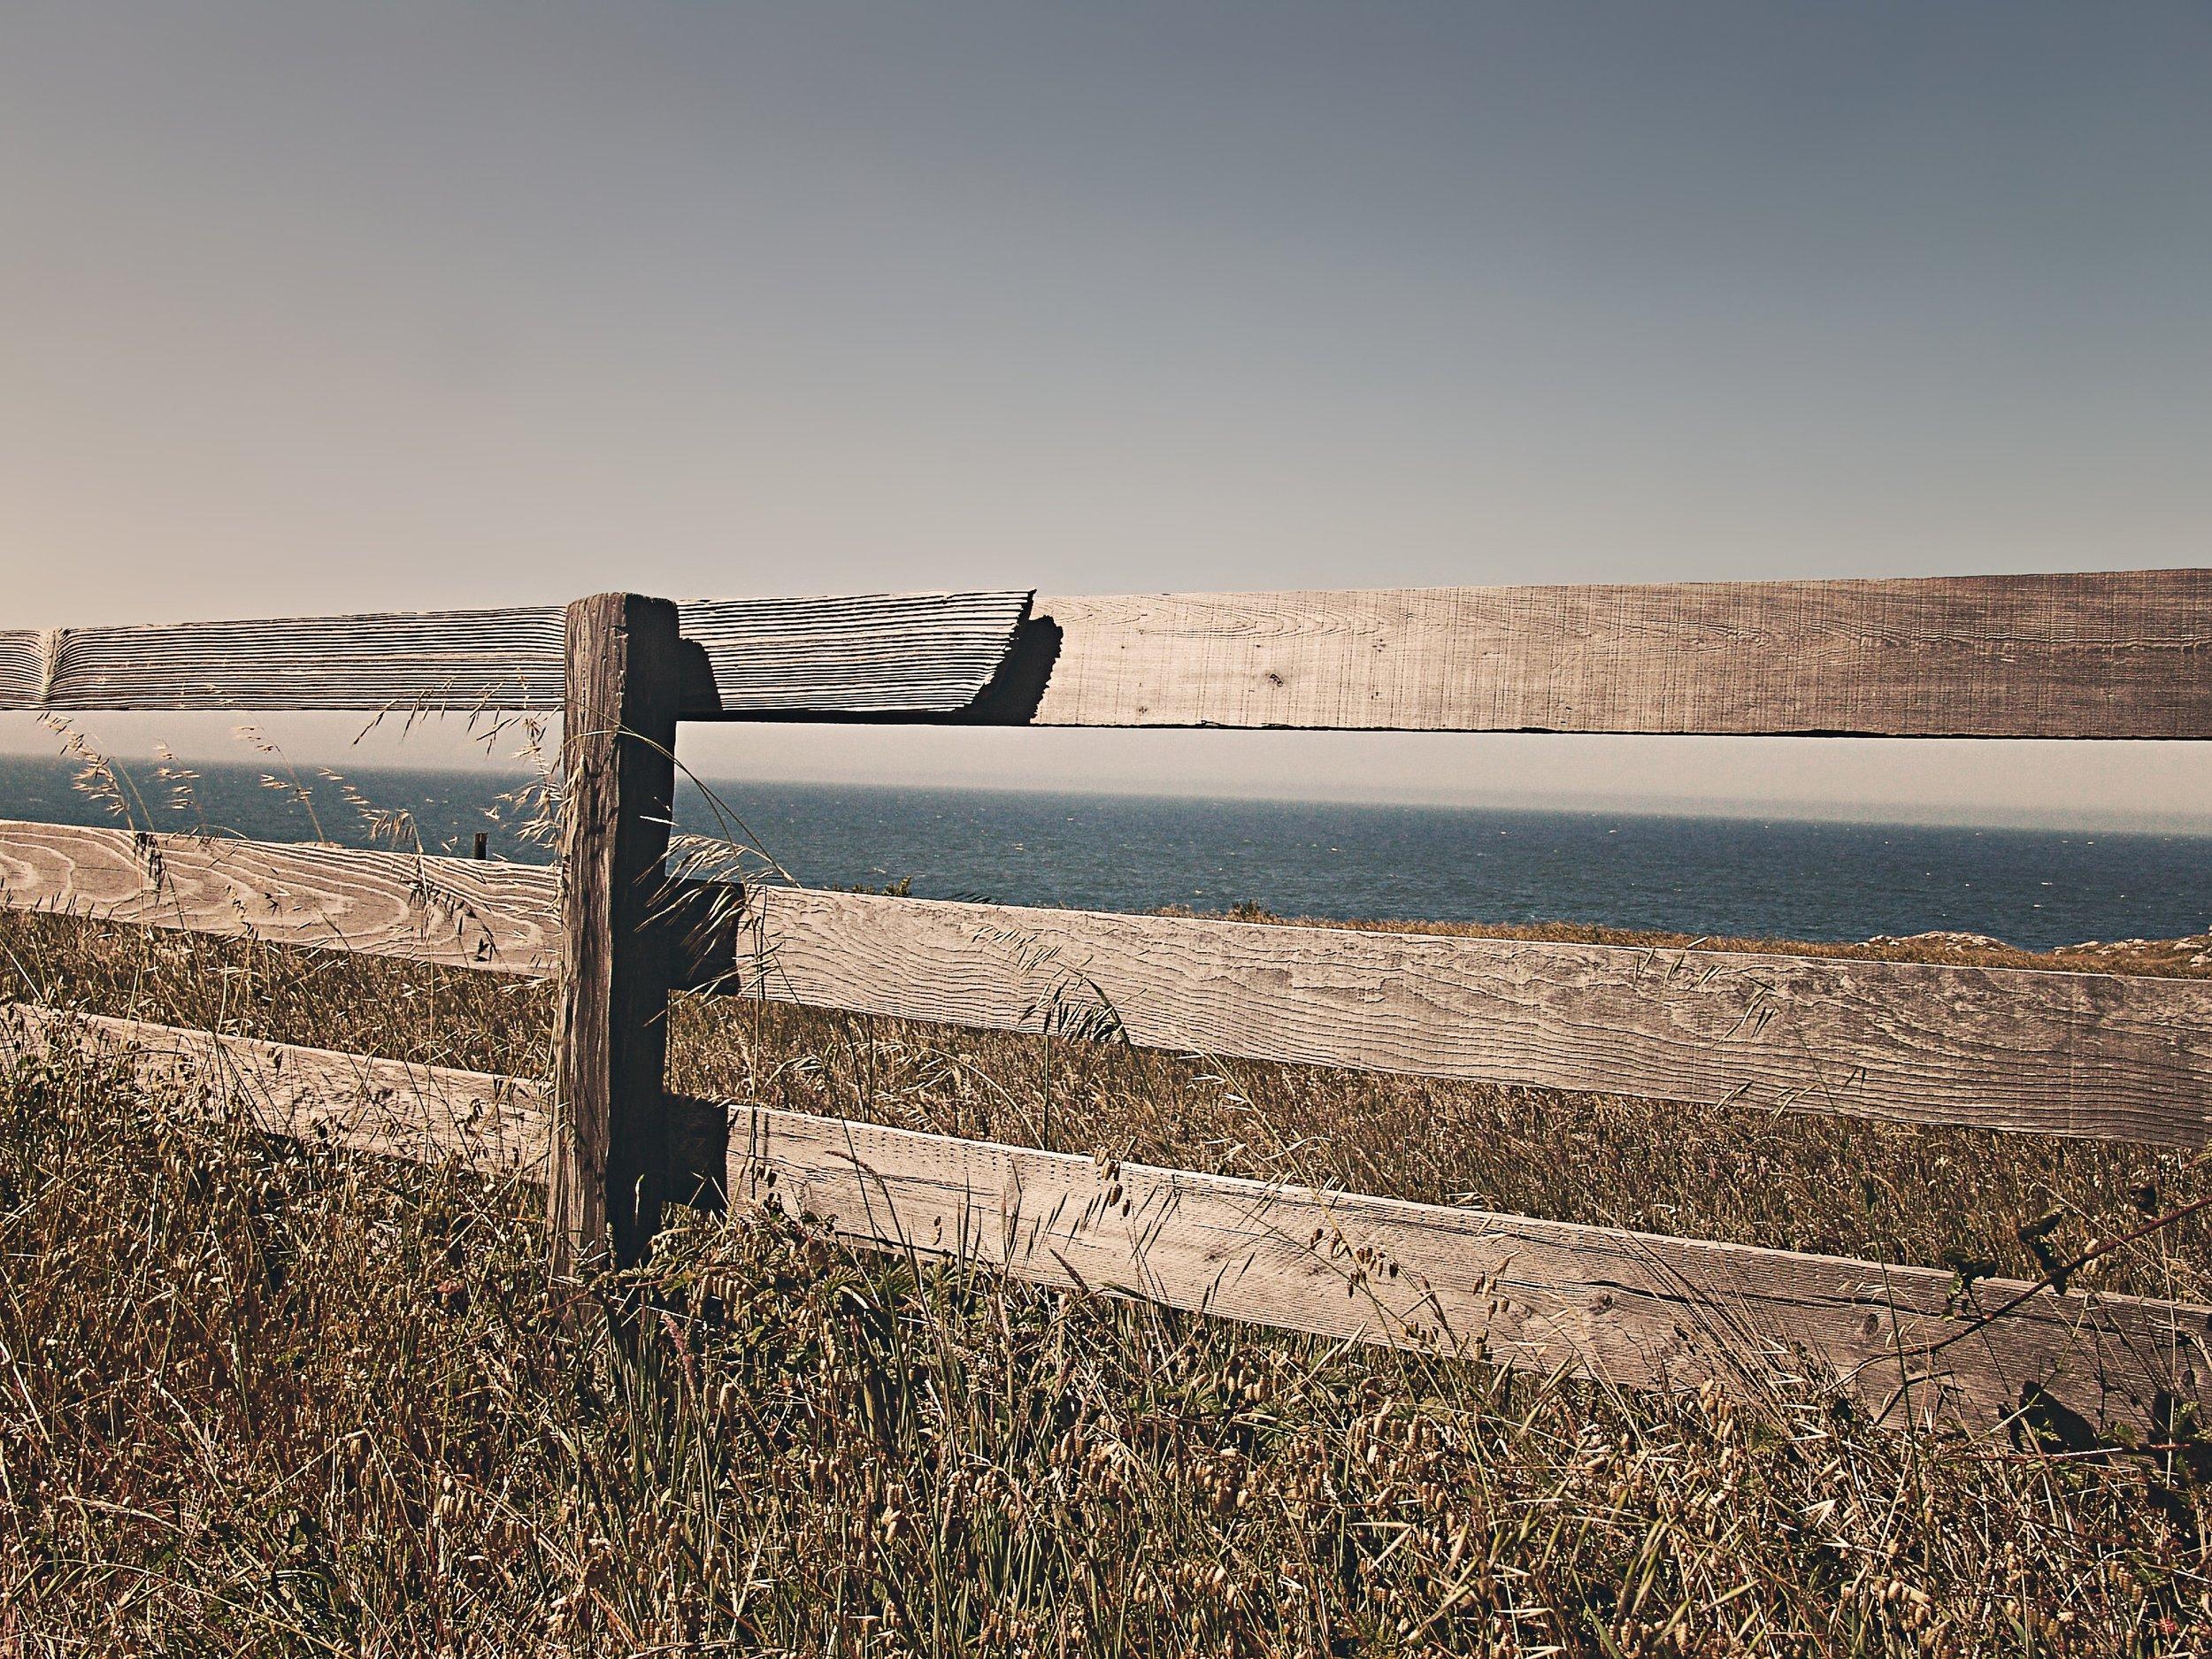 border-fence-meadow-251.jpg